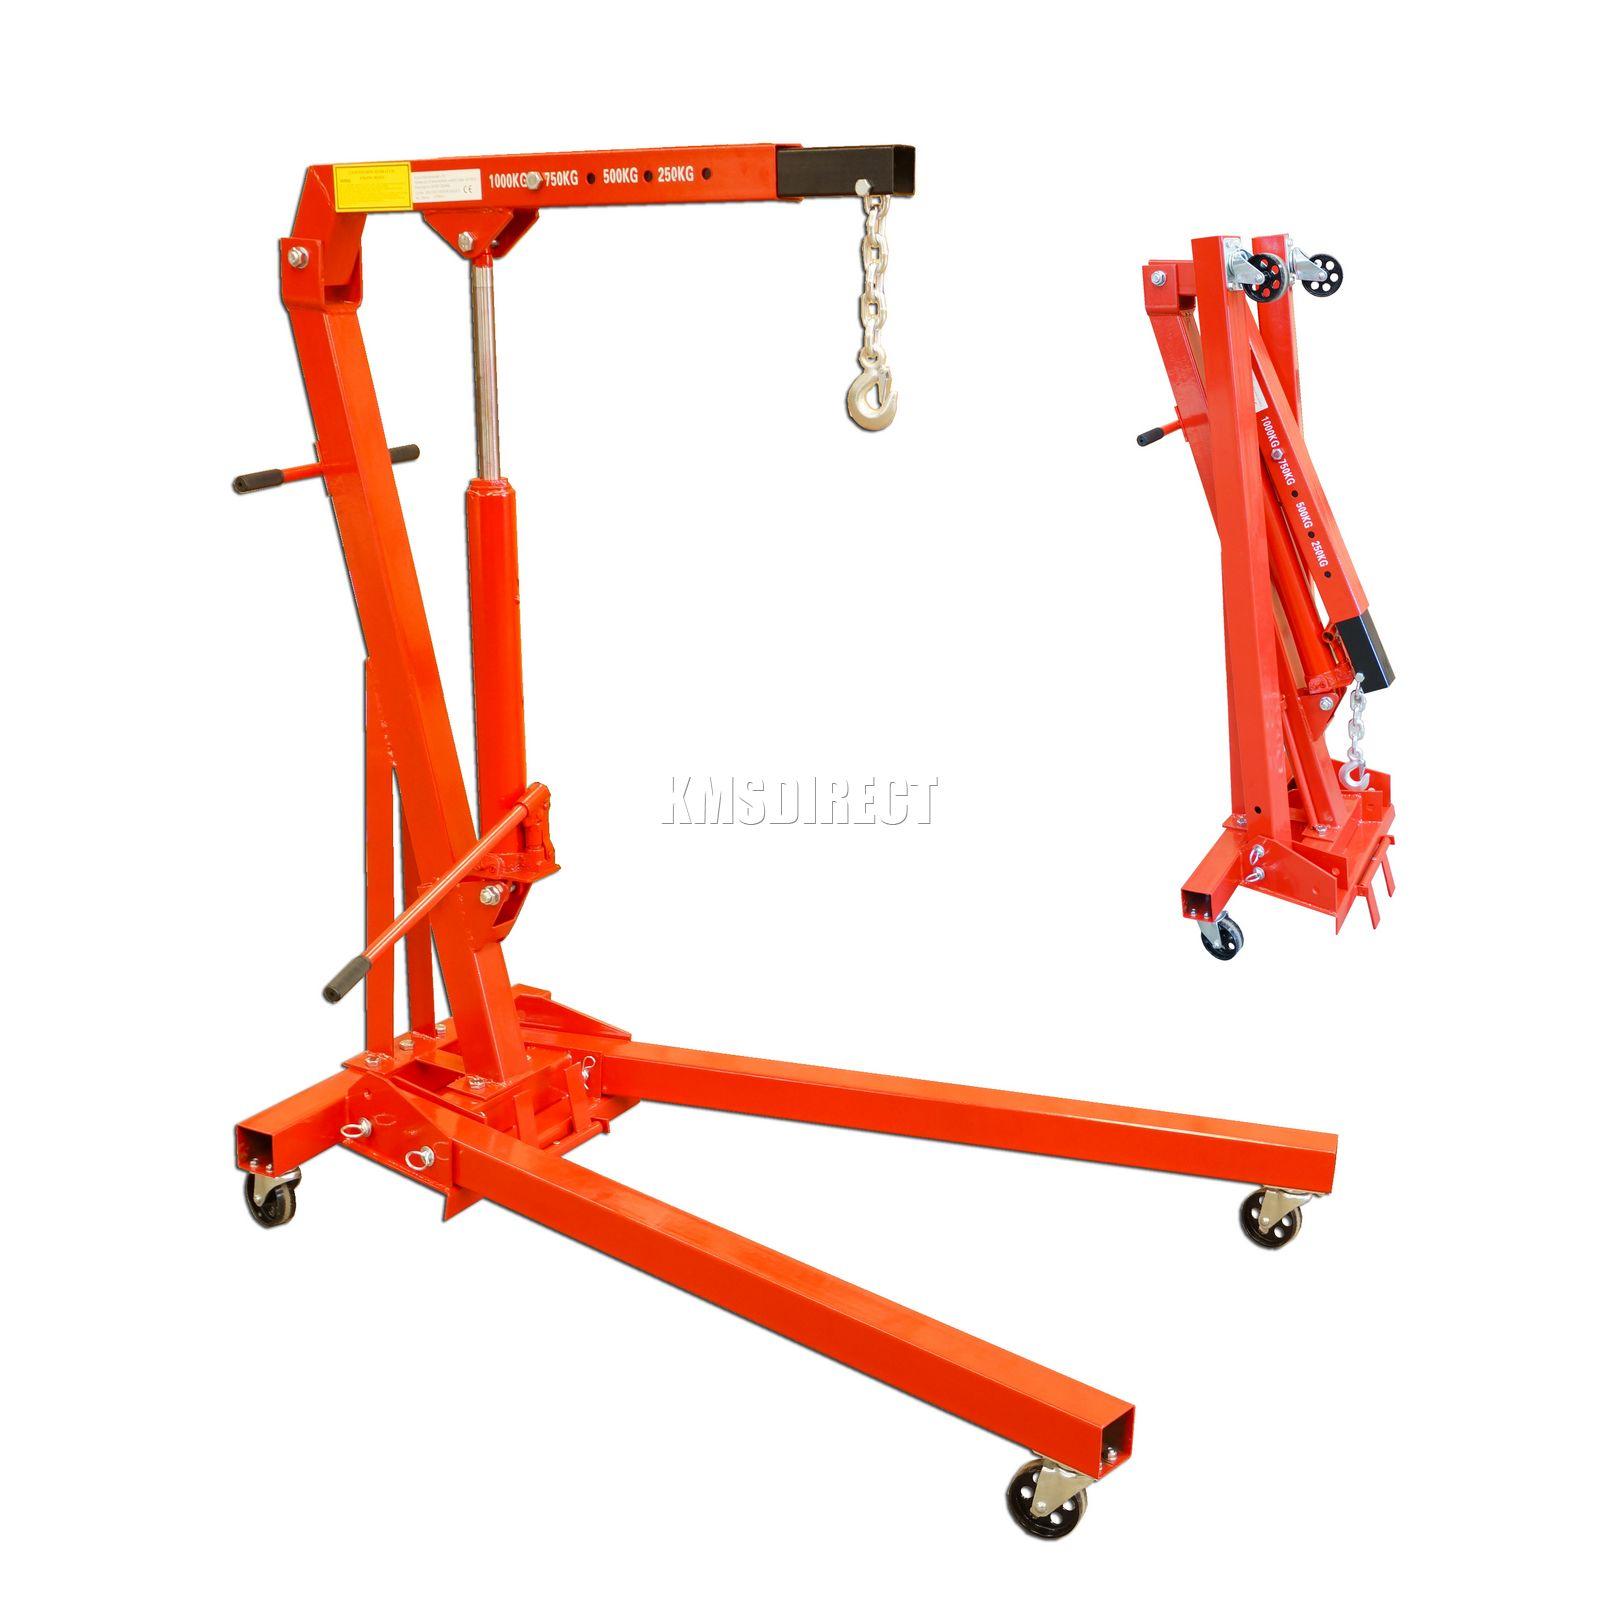 1 Ton Tonne Hydraulic Folding Engine Crane Stand Hoist lift Jack With Wheels New